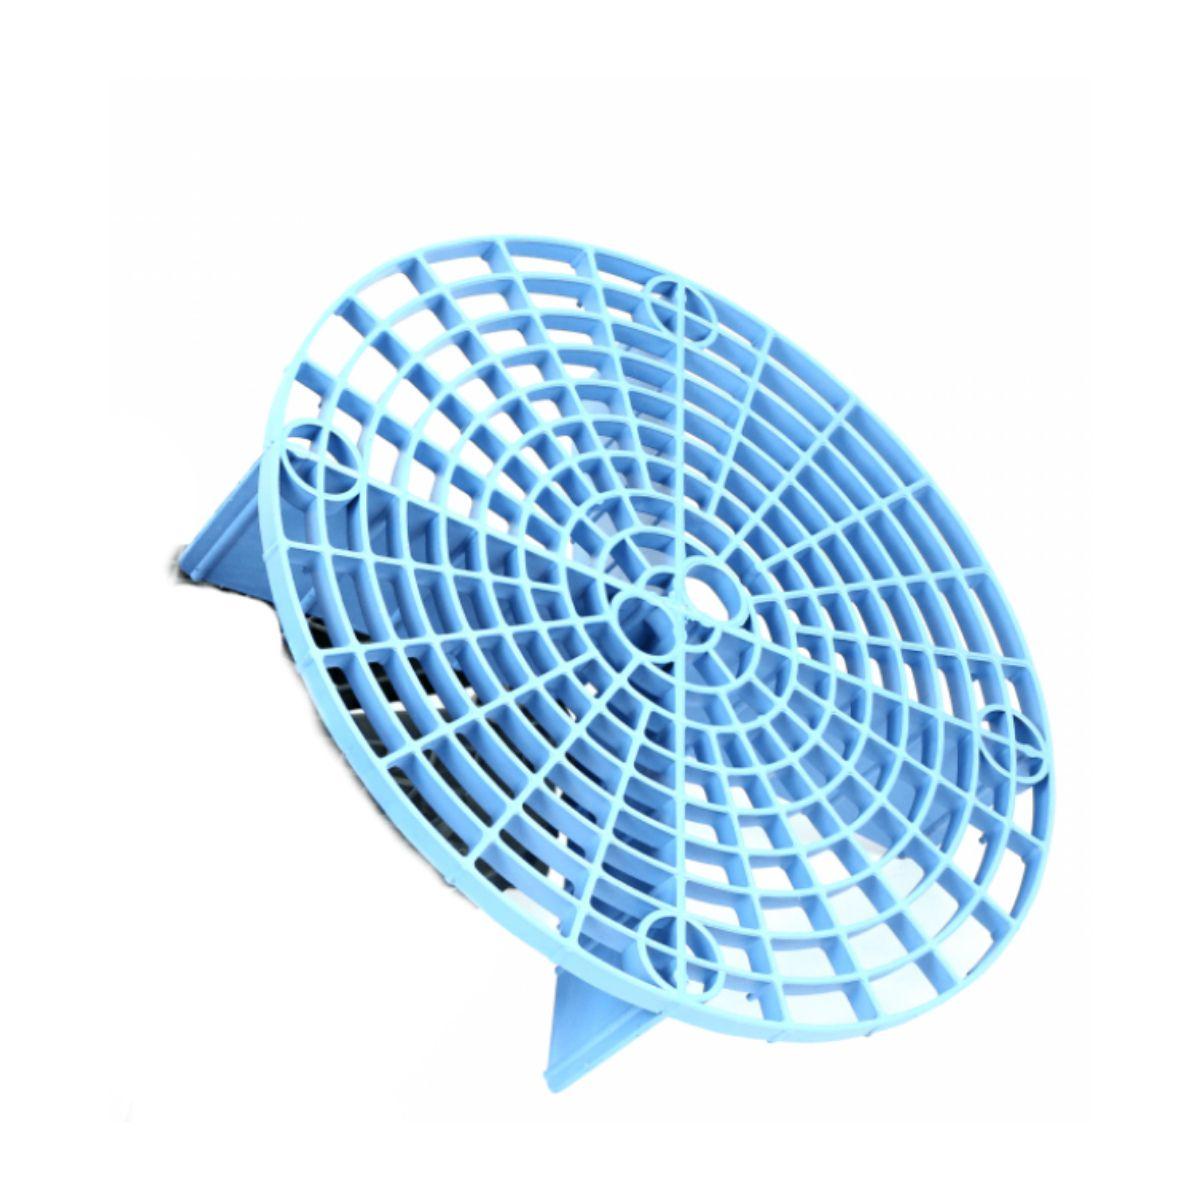 Separador De Partículas para Baldes Grelha Azul - Mandala Detailer